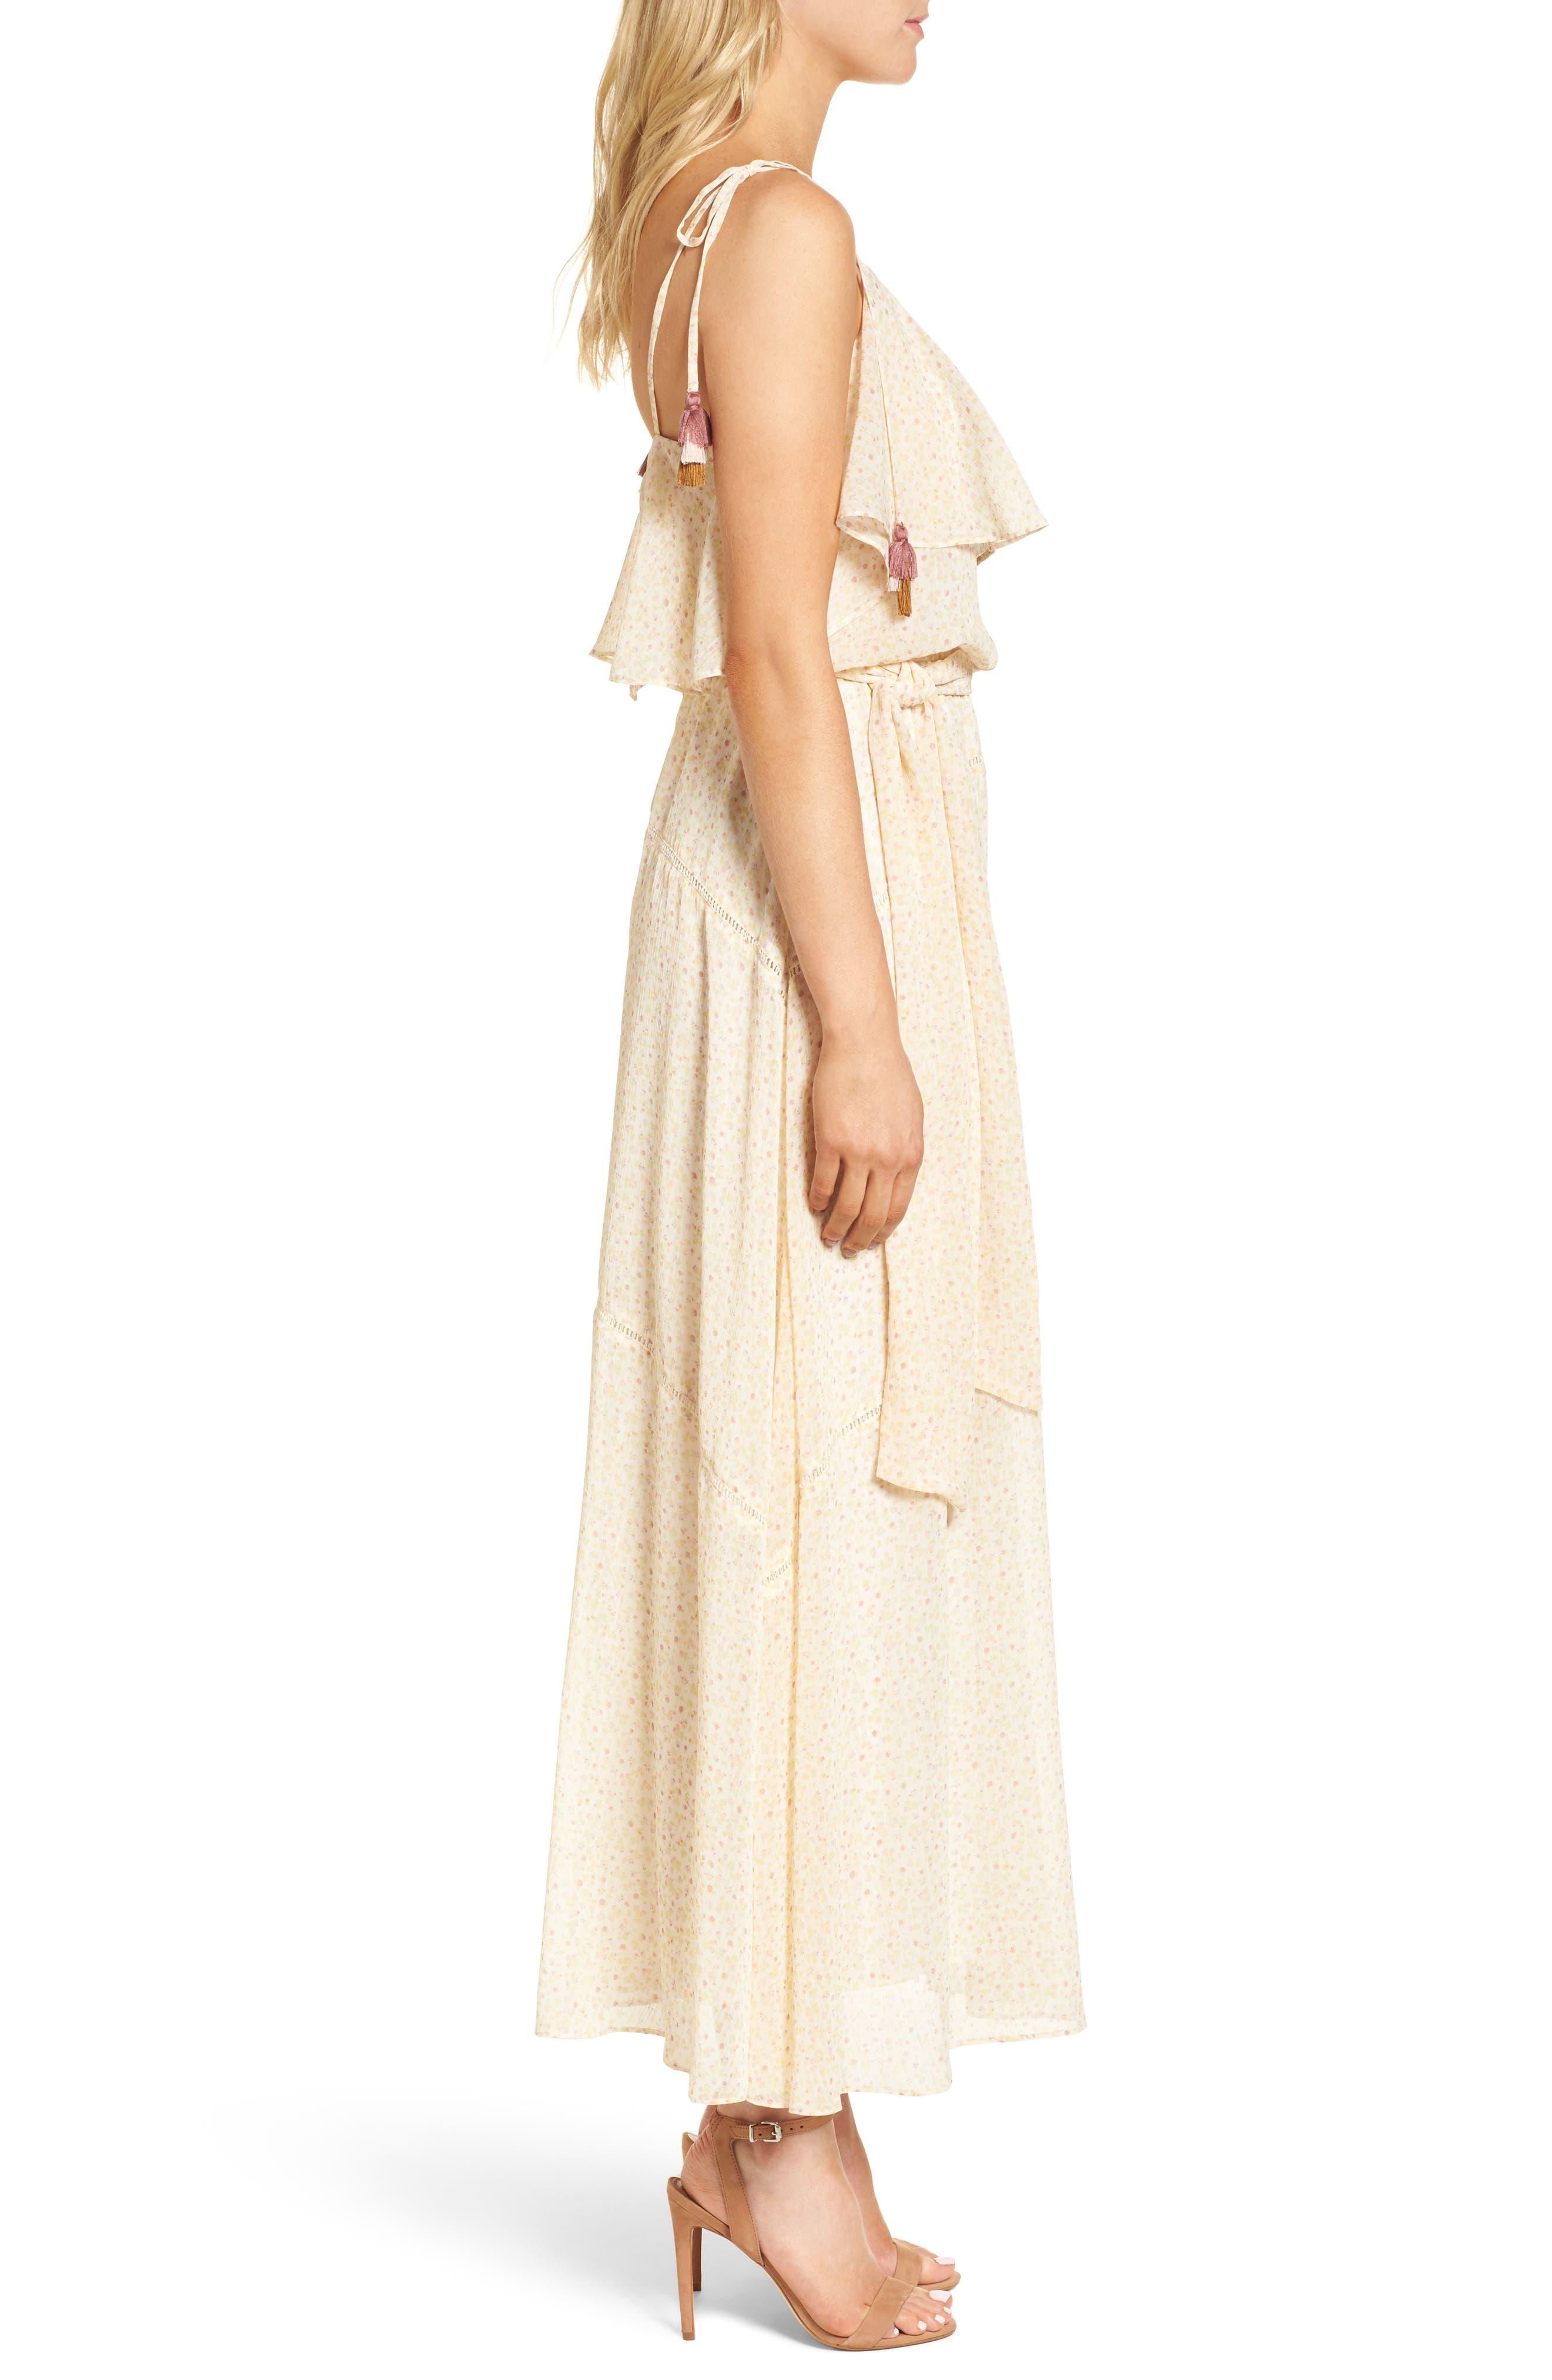 Decklan Maxi Dress,                             Alternate thumbnail 3, color,                             900